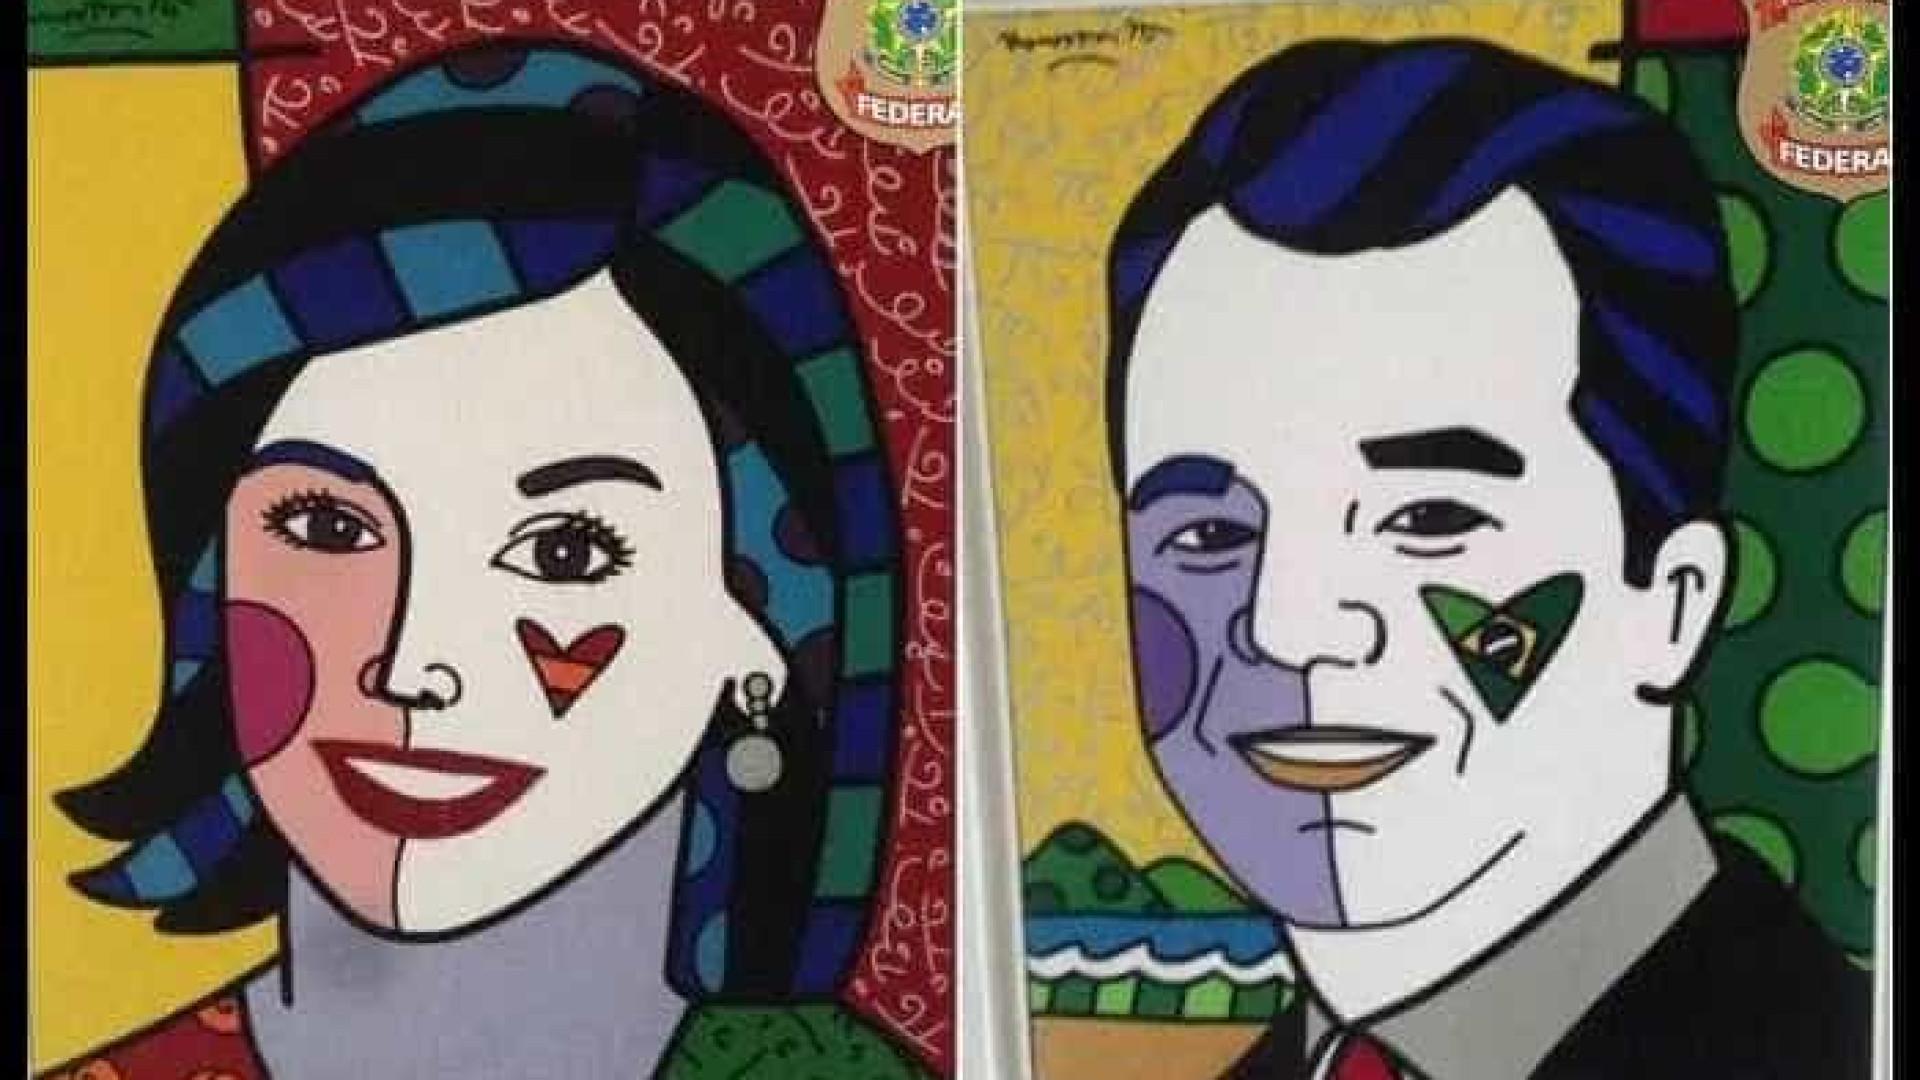 Romero Britto se pronuncia sobre quadros de Sérgio Cabral